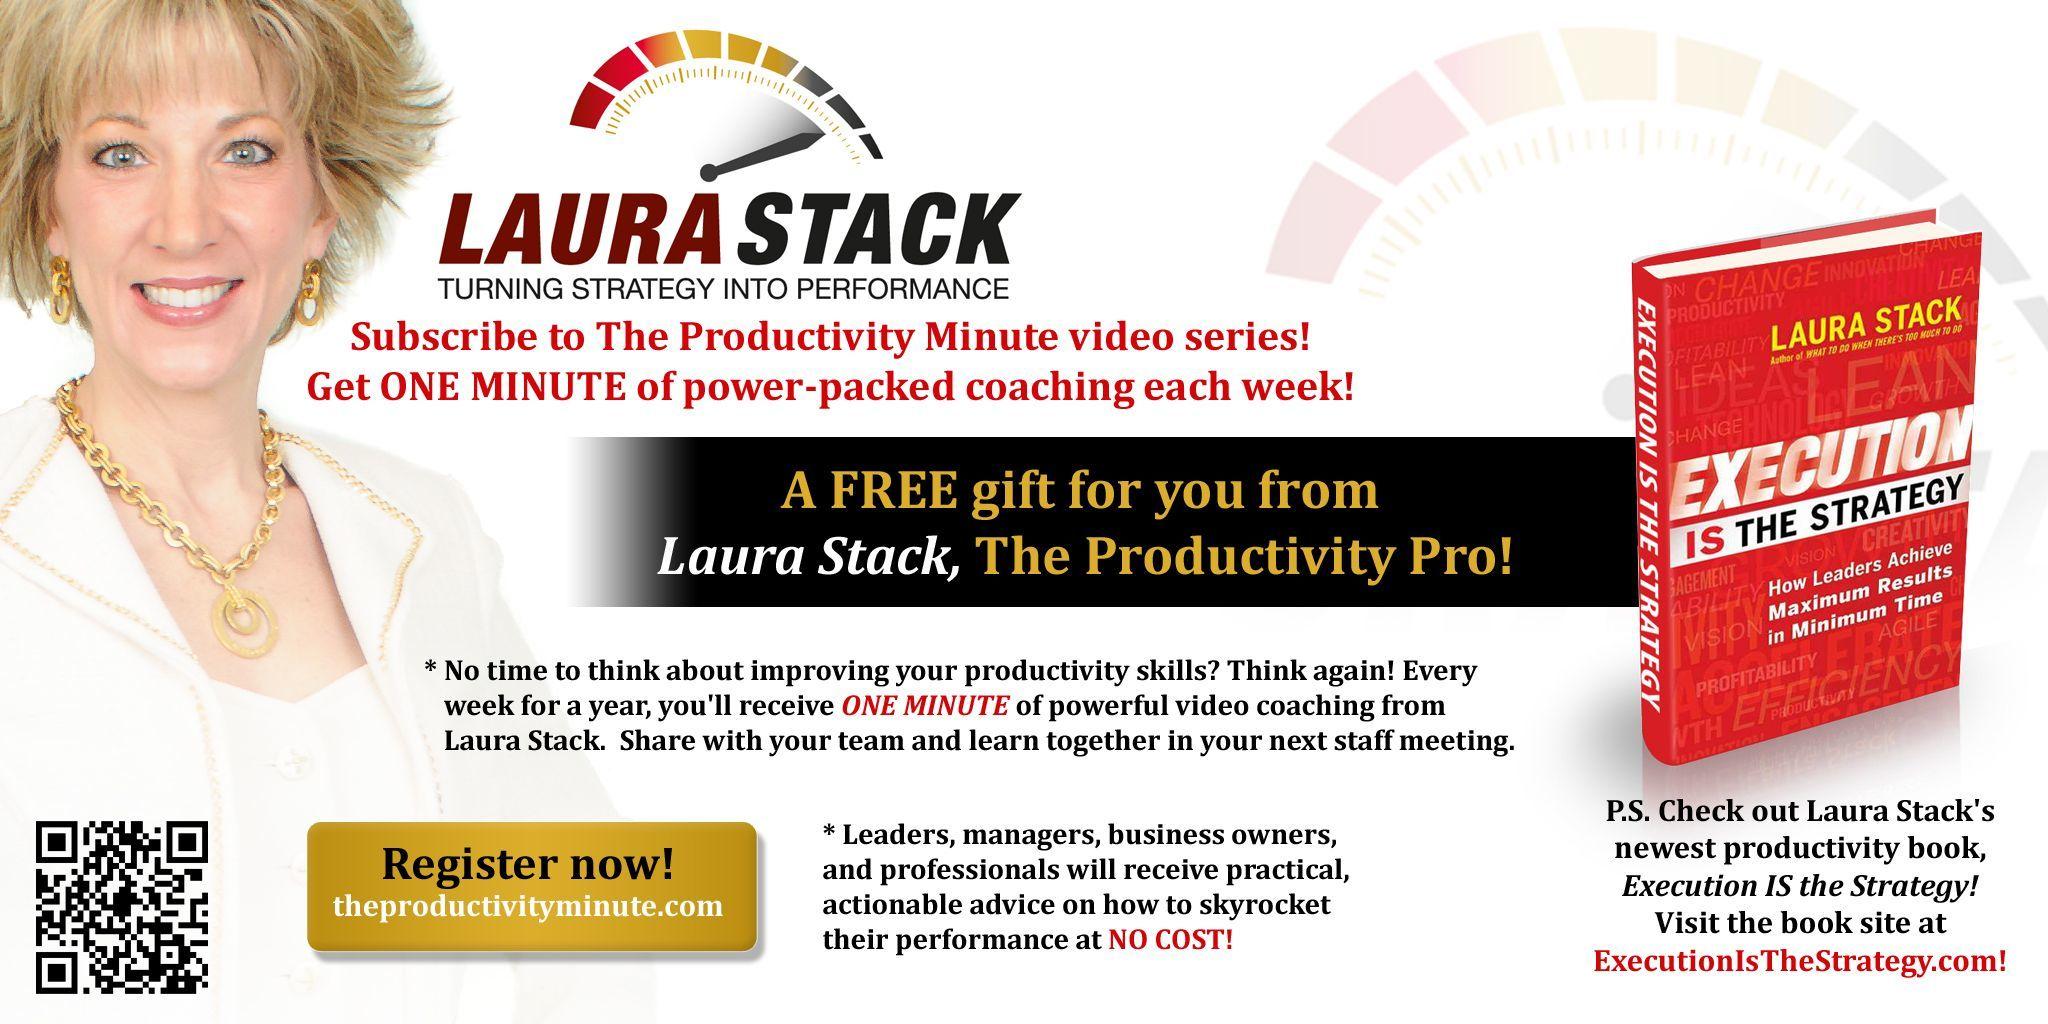 Laura's video series